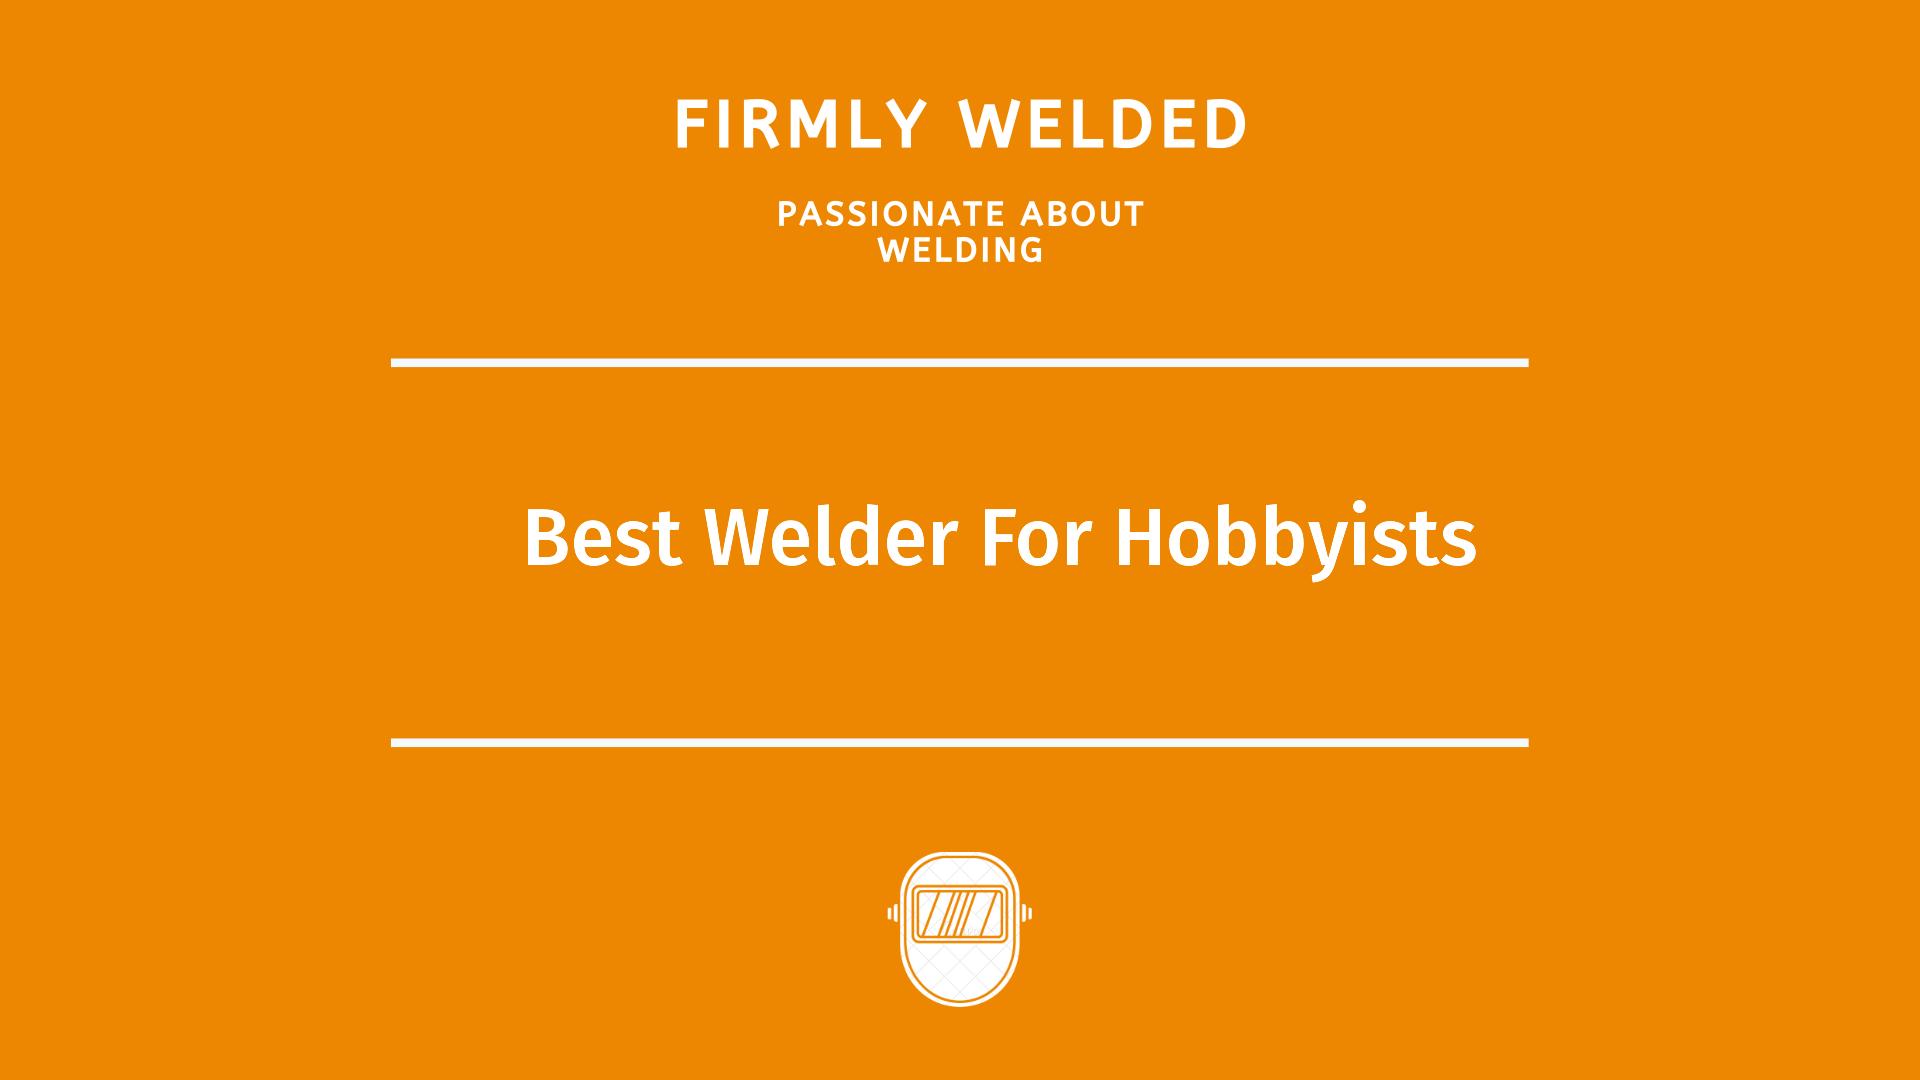 Best Welder For Hobbyists